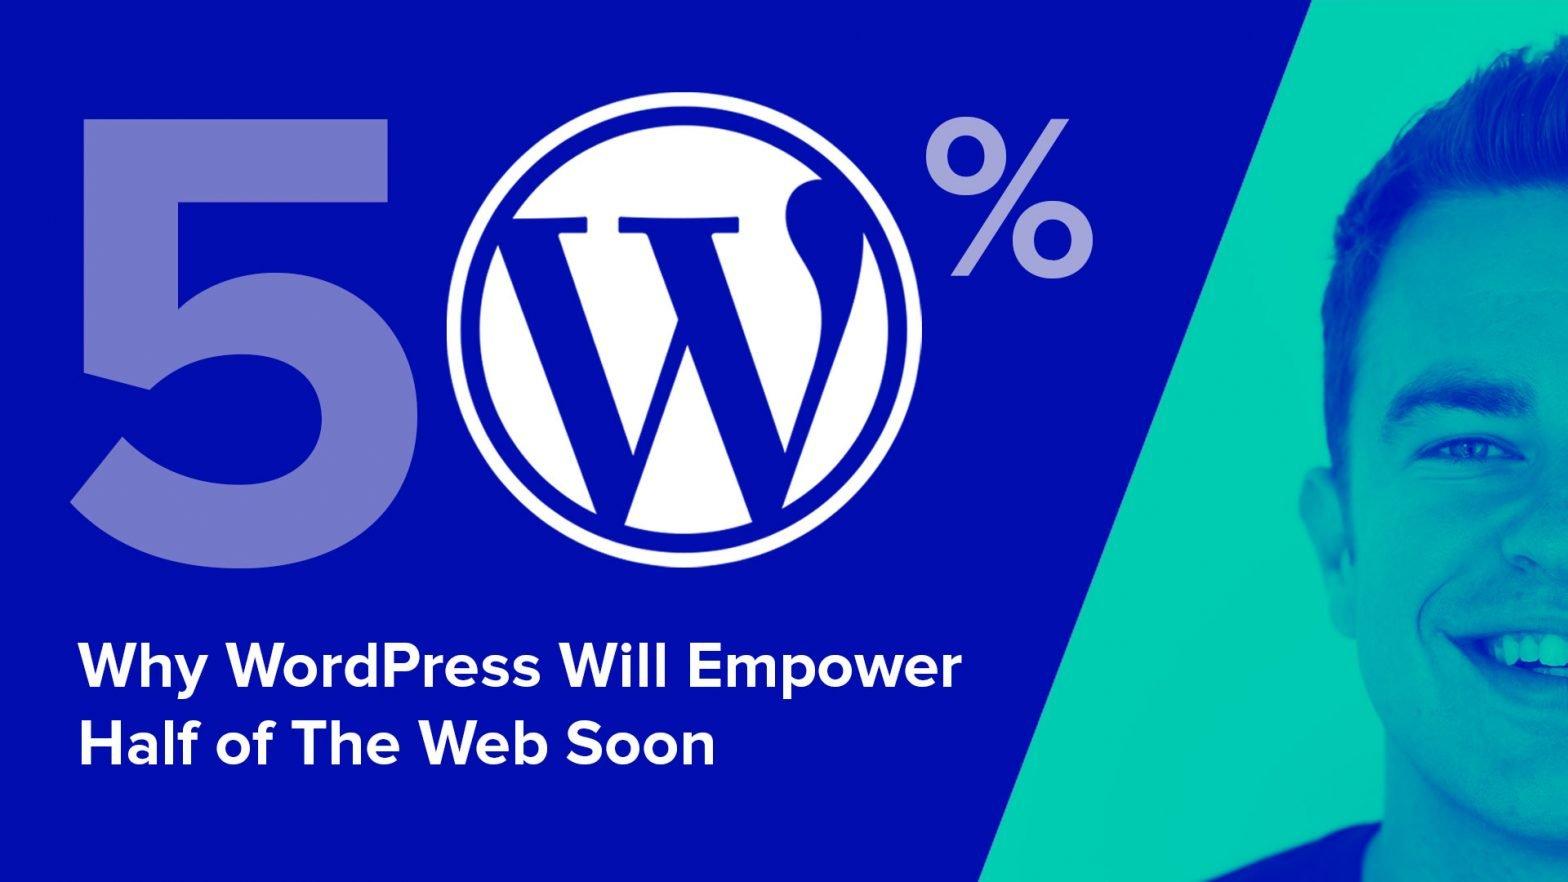 Why WordPress Will Empower Half of the Web Soon - Sebastiaan van der Lans